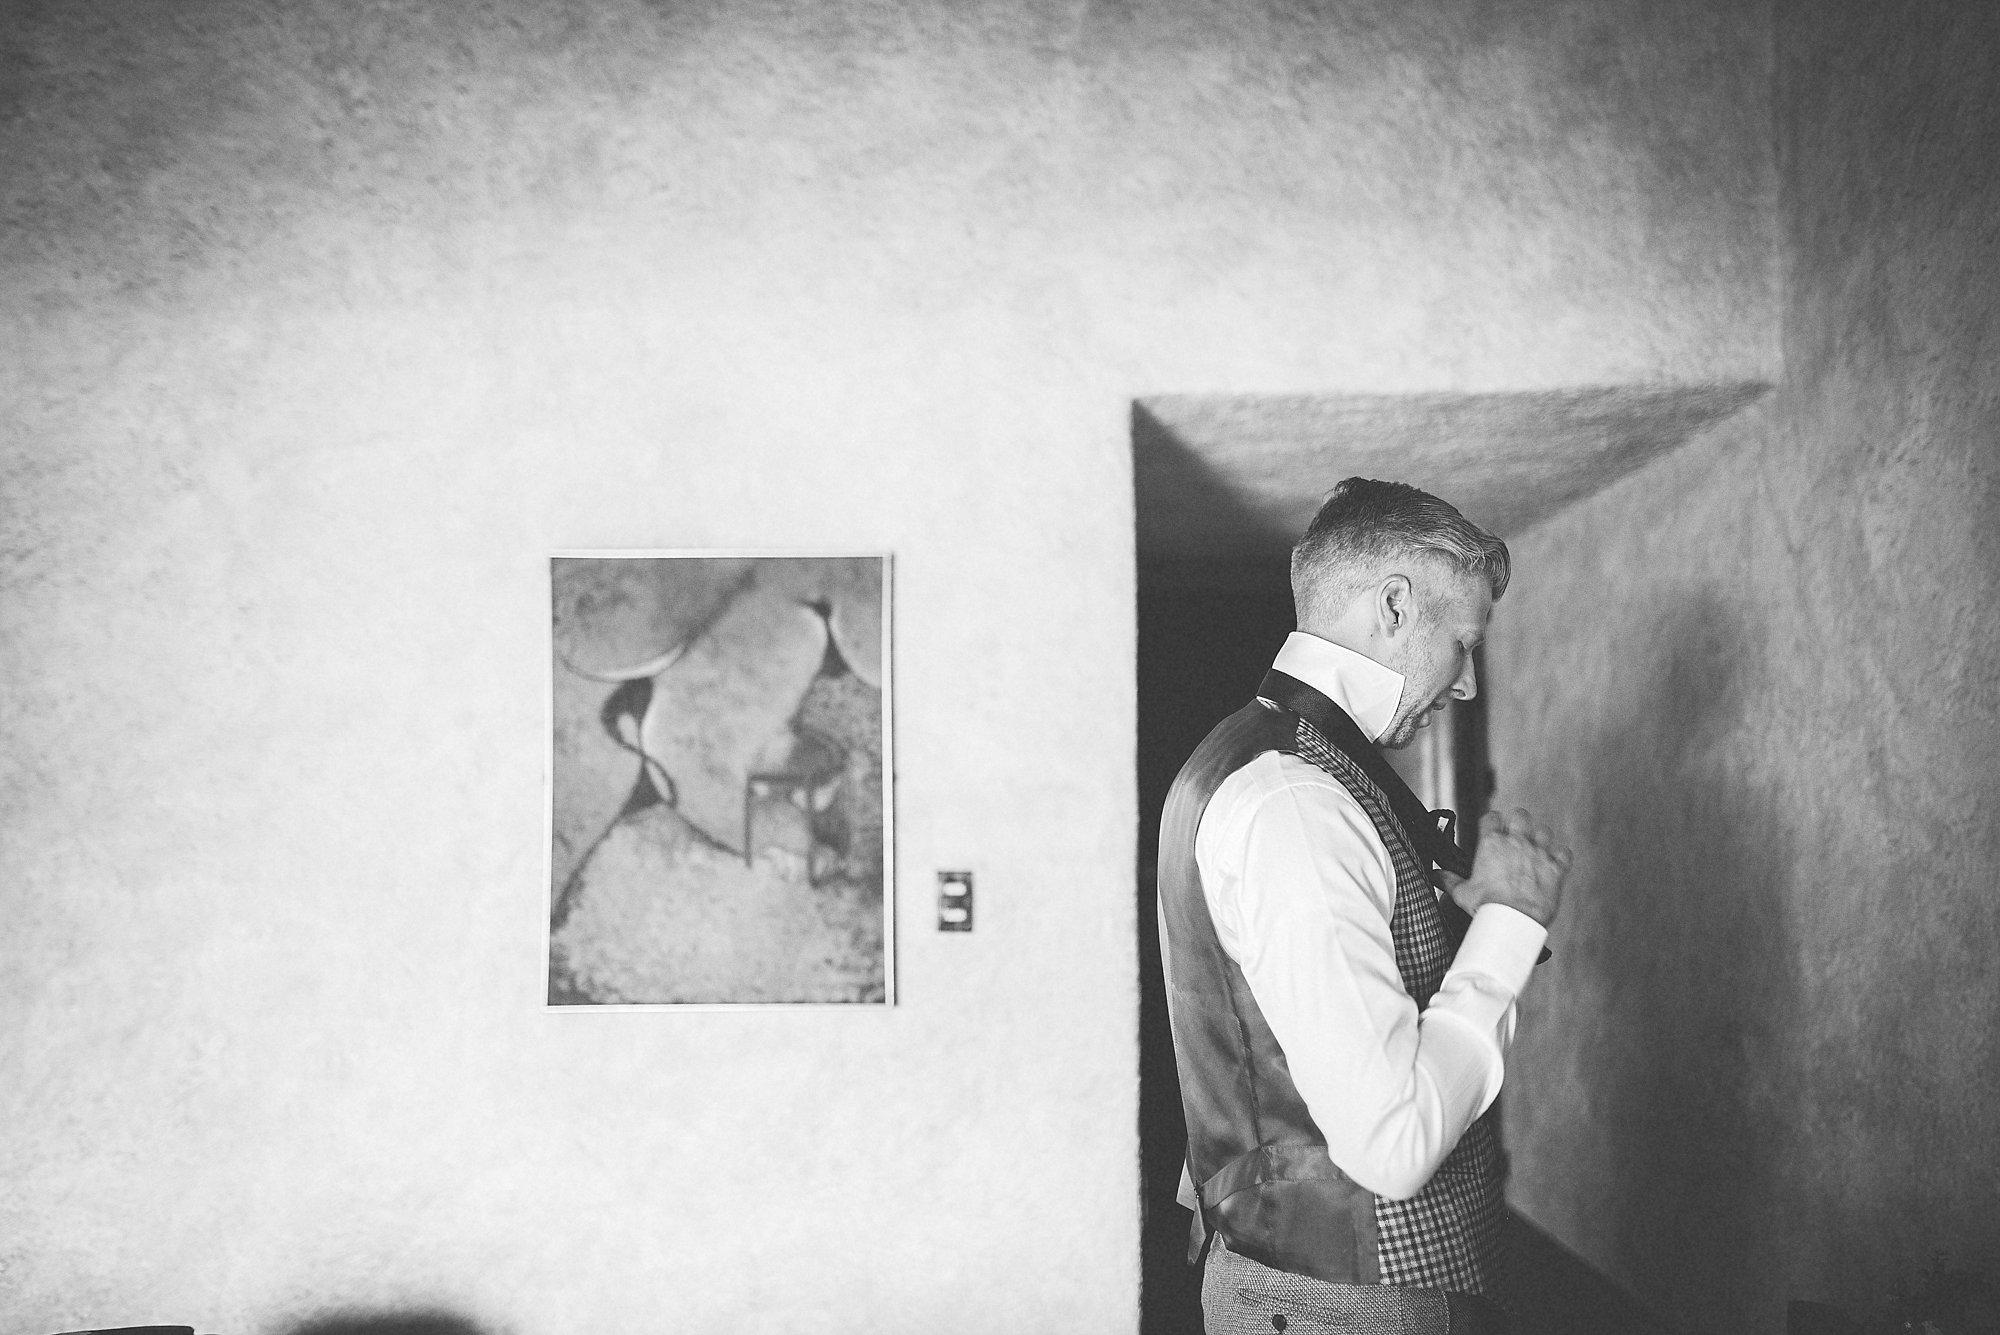 alex-yazmin-wedding-photographer-antigua-guatemala-049